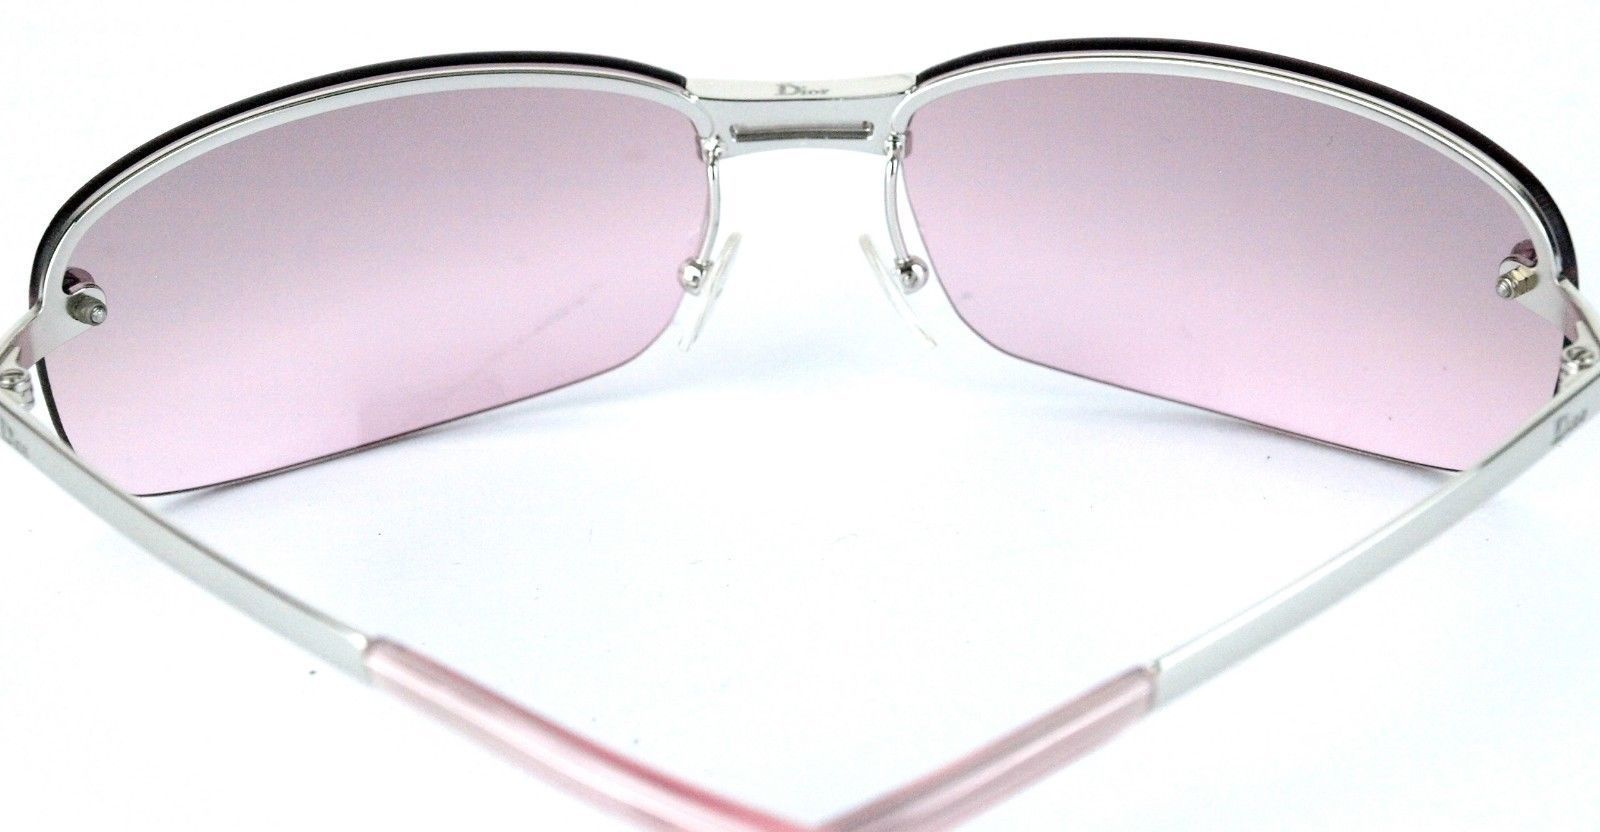 3987227a8475 100% Authentic Christian DIOR Sunglass Pink Adorable 3 L YB7DU 64 16 115